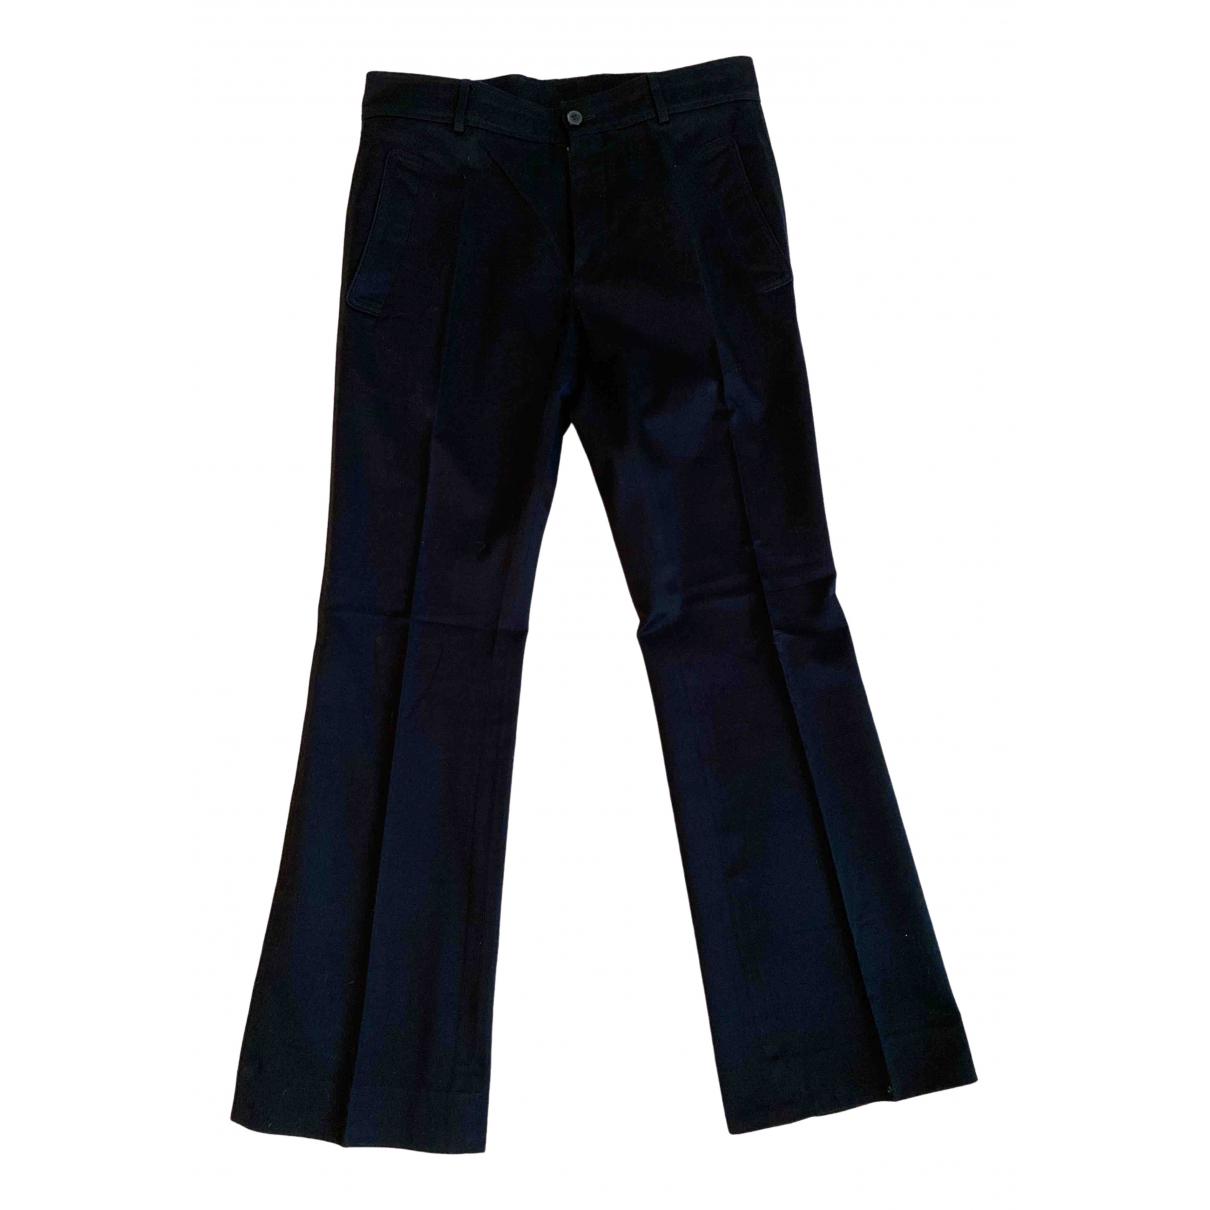 Pantalones en Algodon Negro Yves Saint Laurent